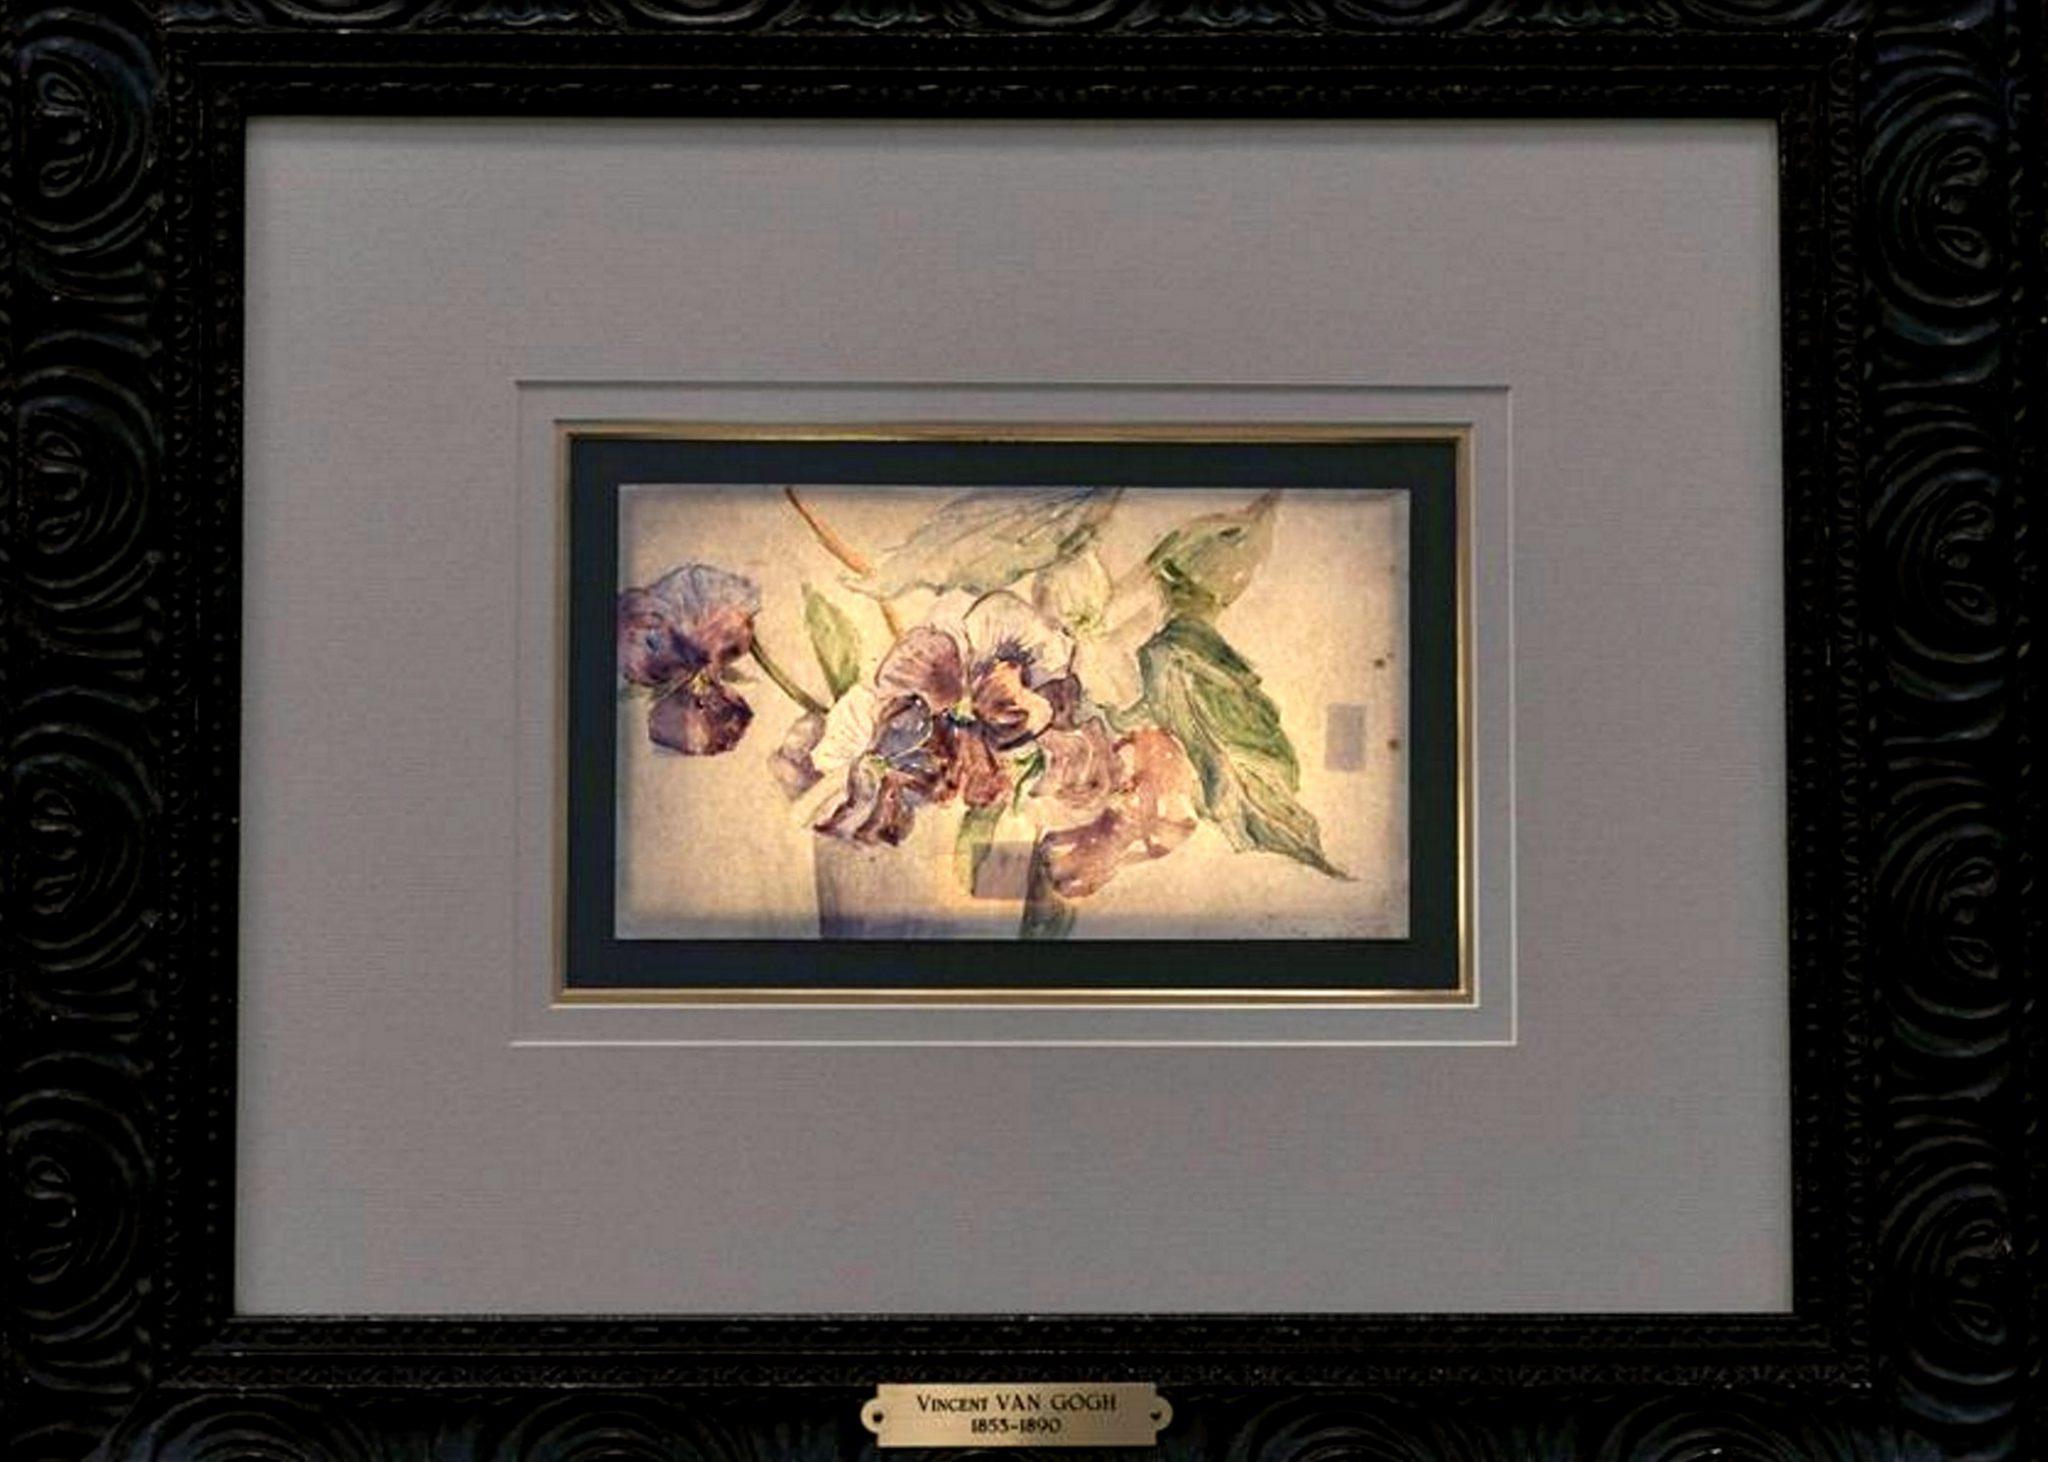 L'acquerello floreale di van Gogh venduto a Gand